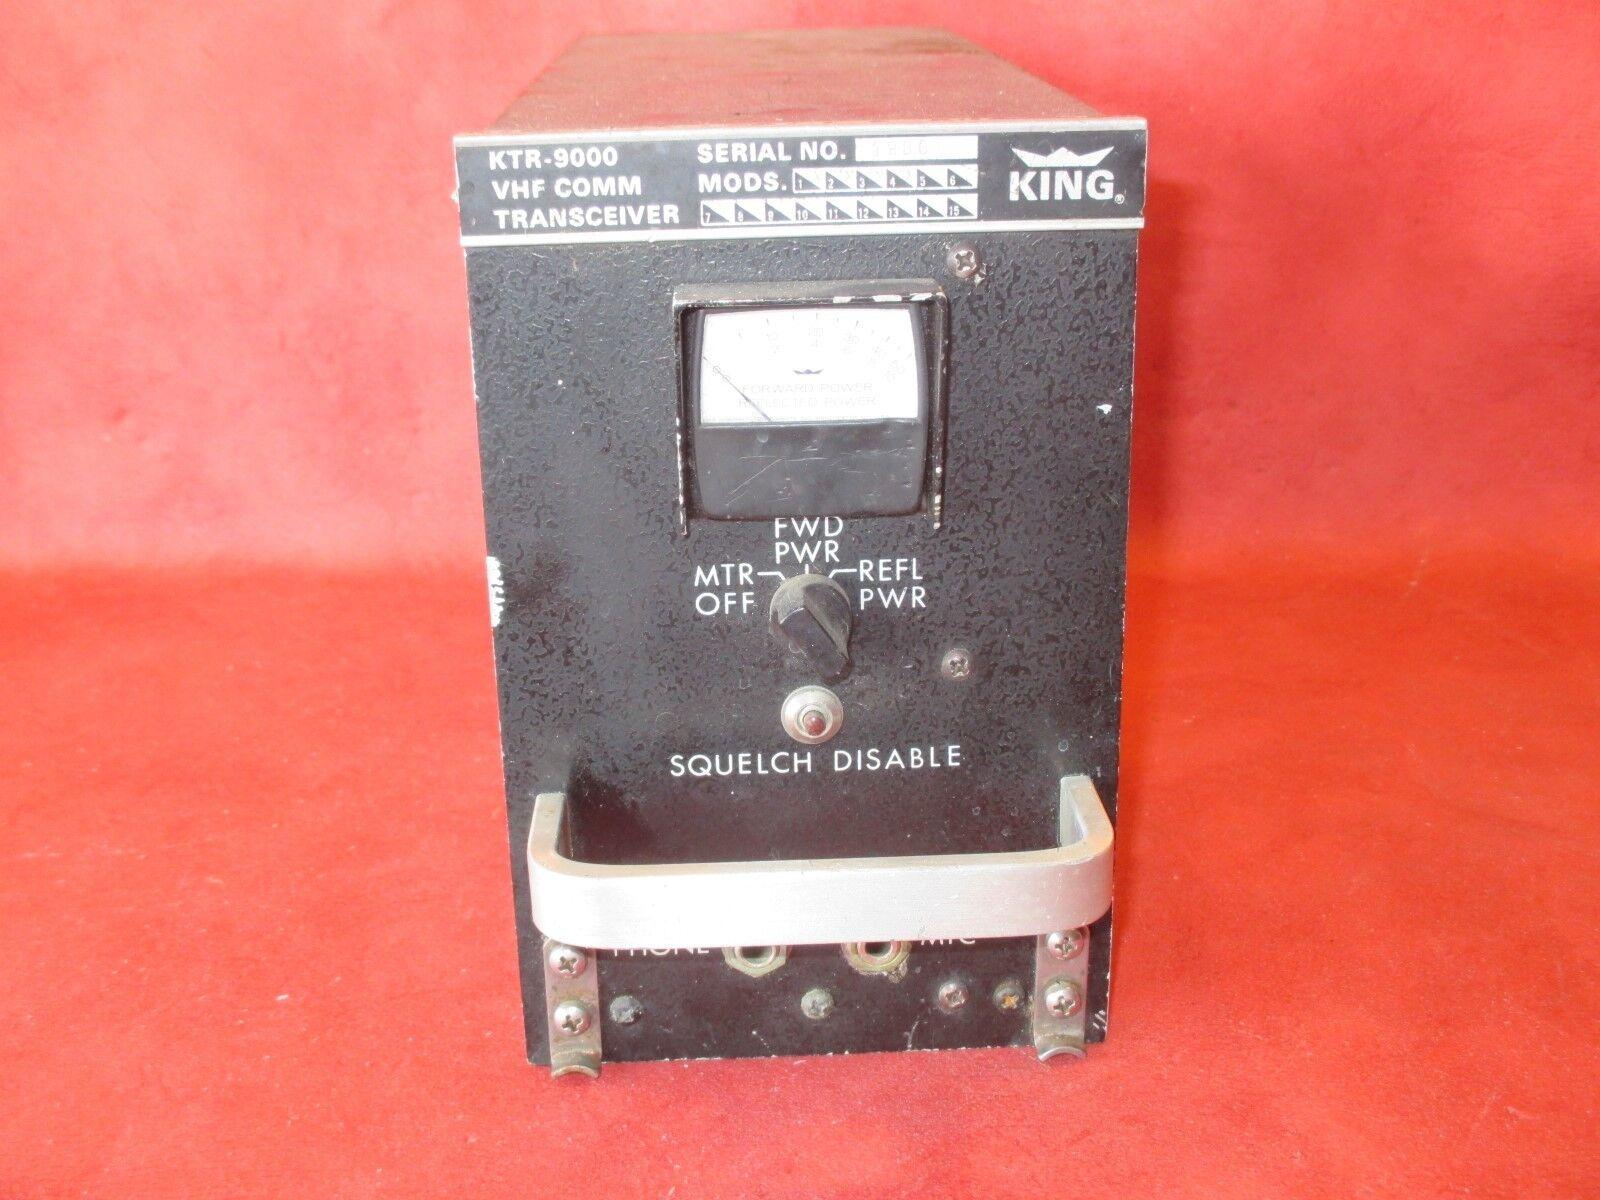 King Radio Corp KTR 9000 VHF COMM Transceiver PN 064-1004-00